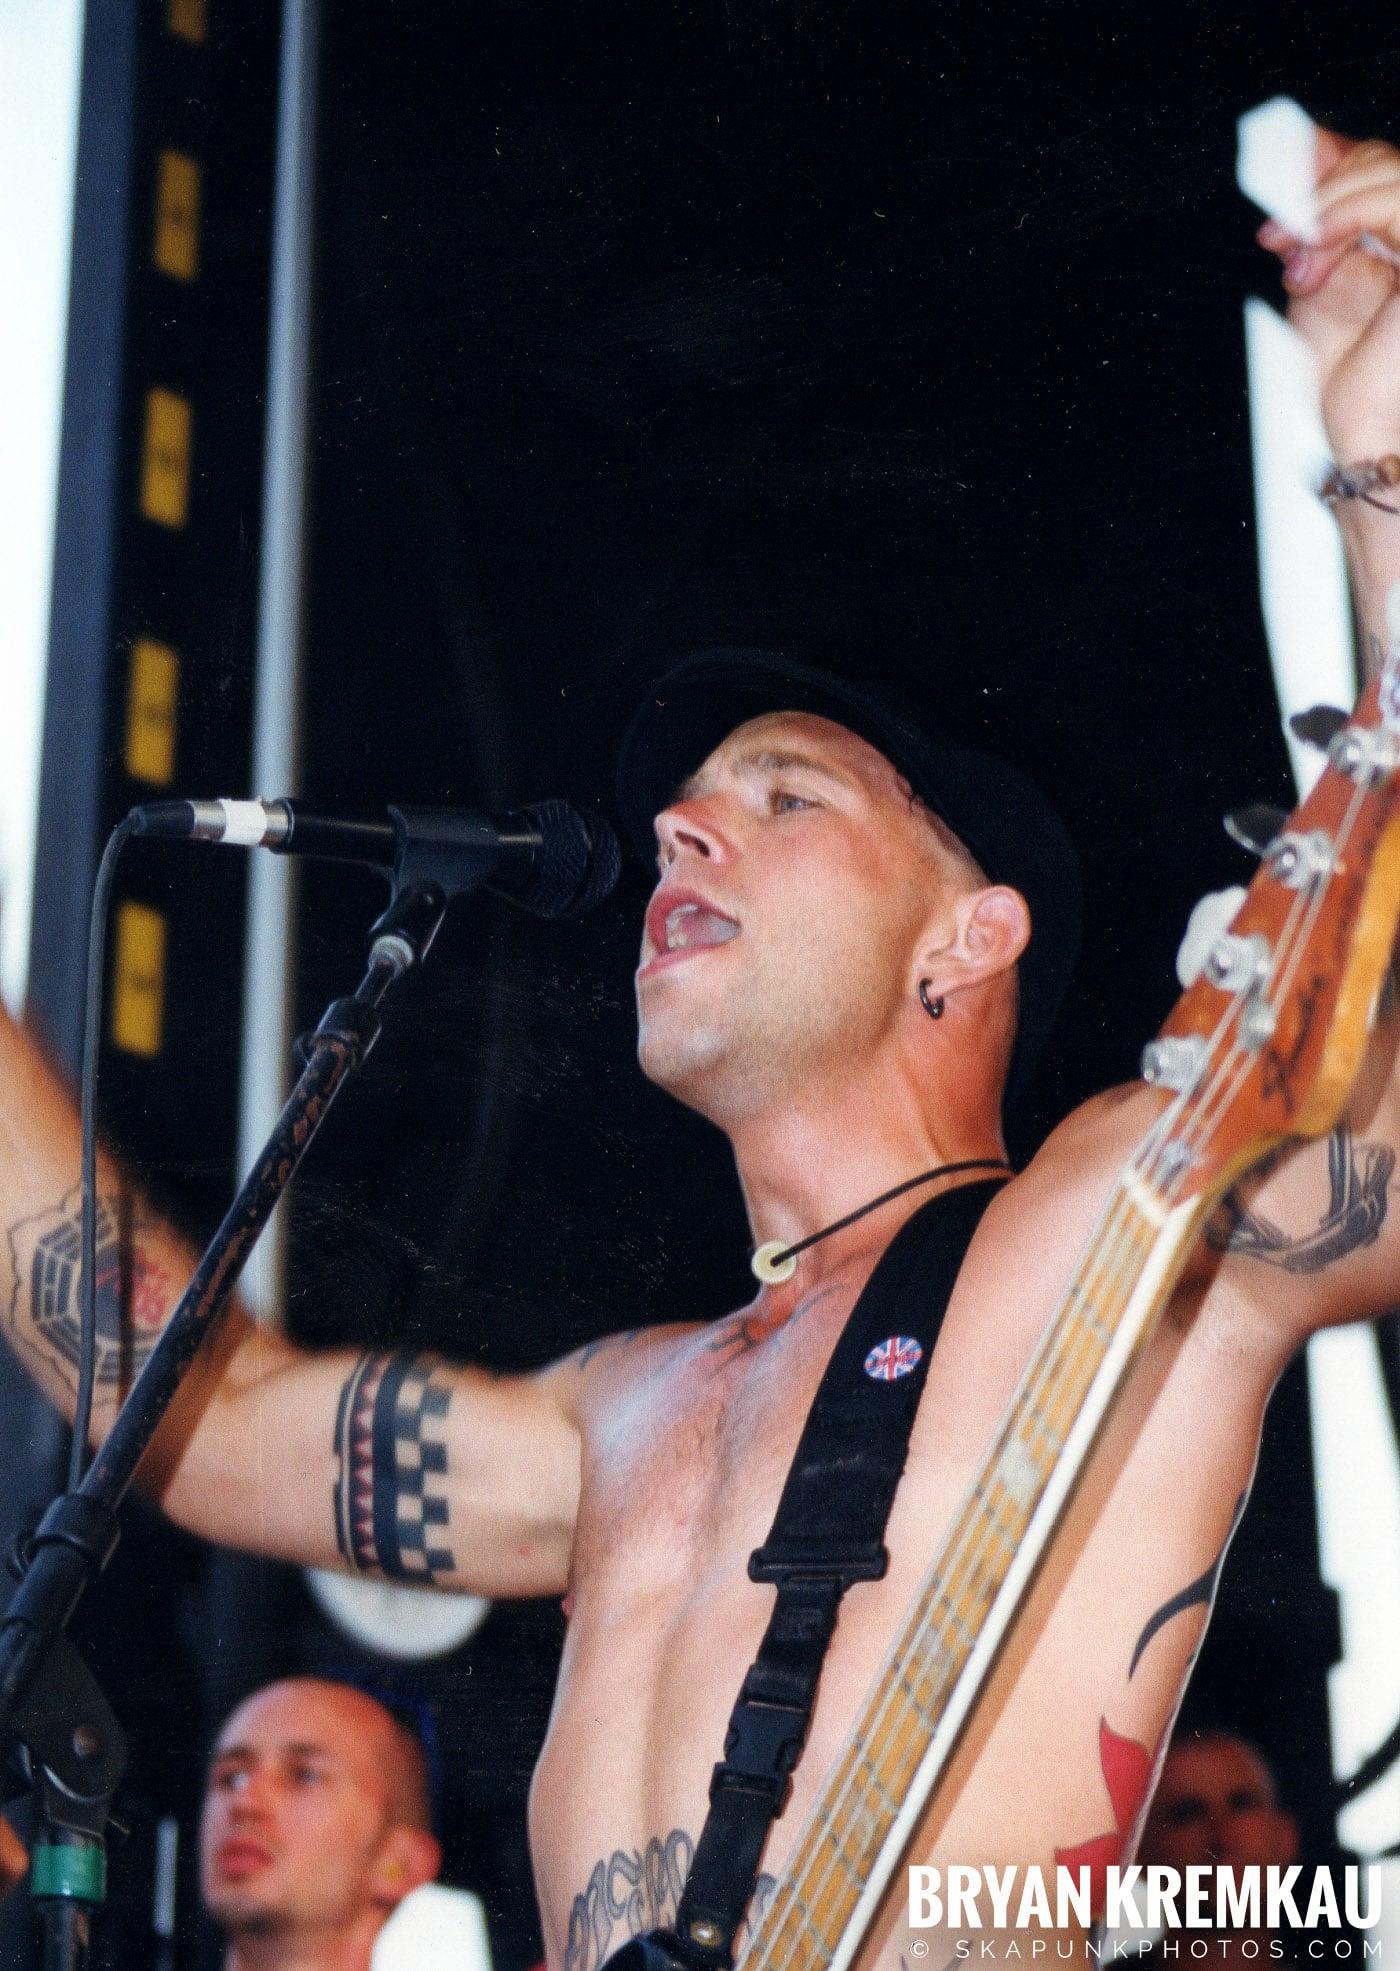 The Bouncing Souls @ Vans Warped Tour, Randall's Island, NYC - 7.16.99 (9)